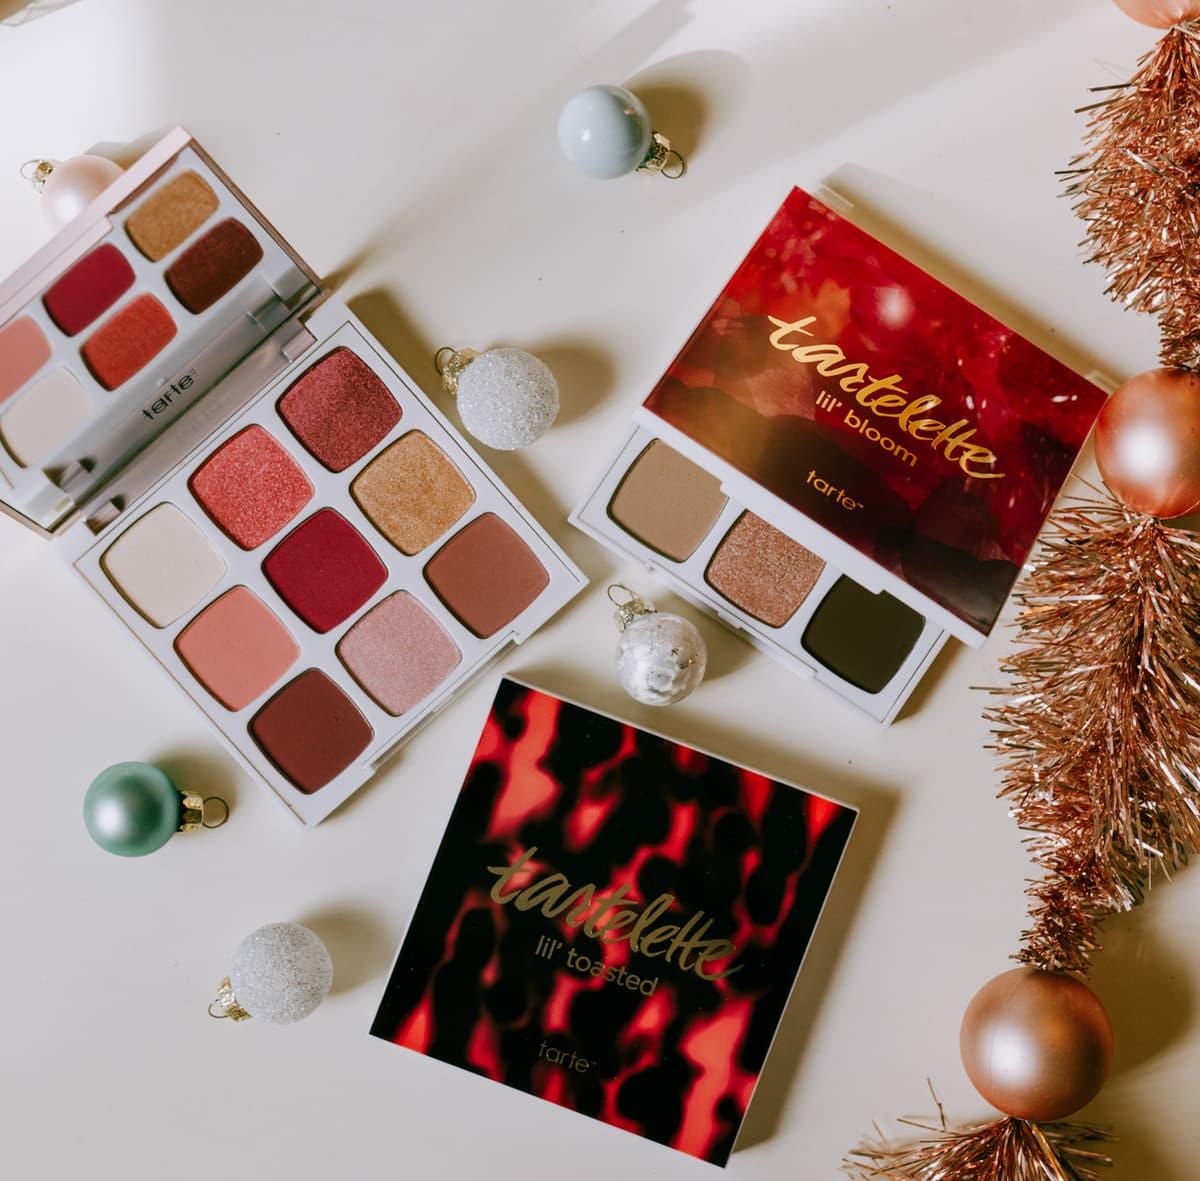 tarte eyeshadow palette gift ideas